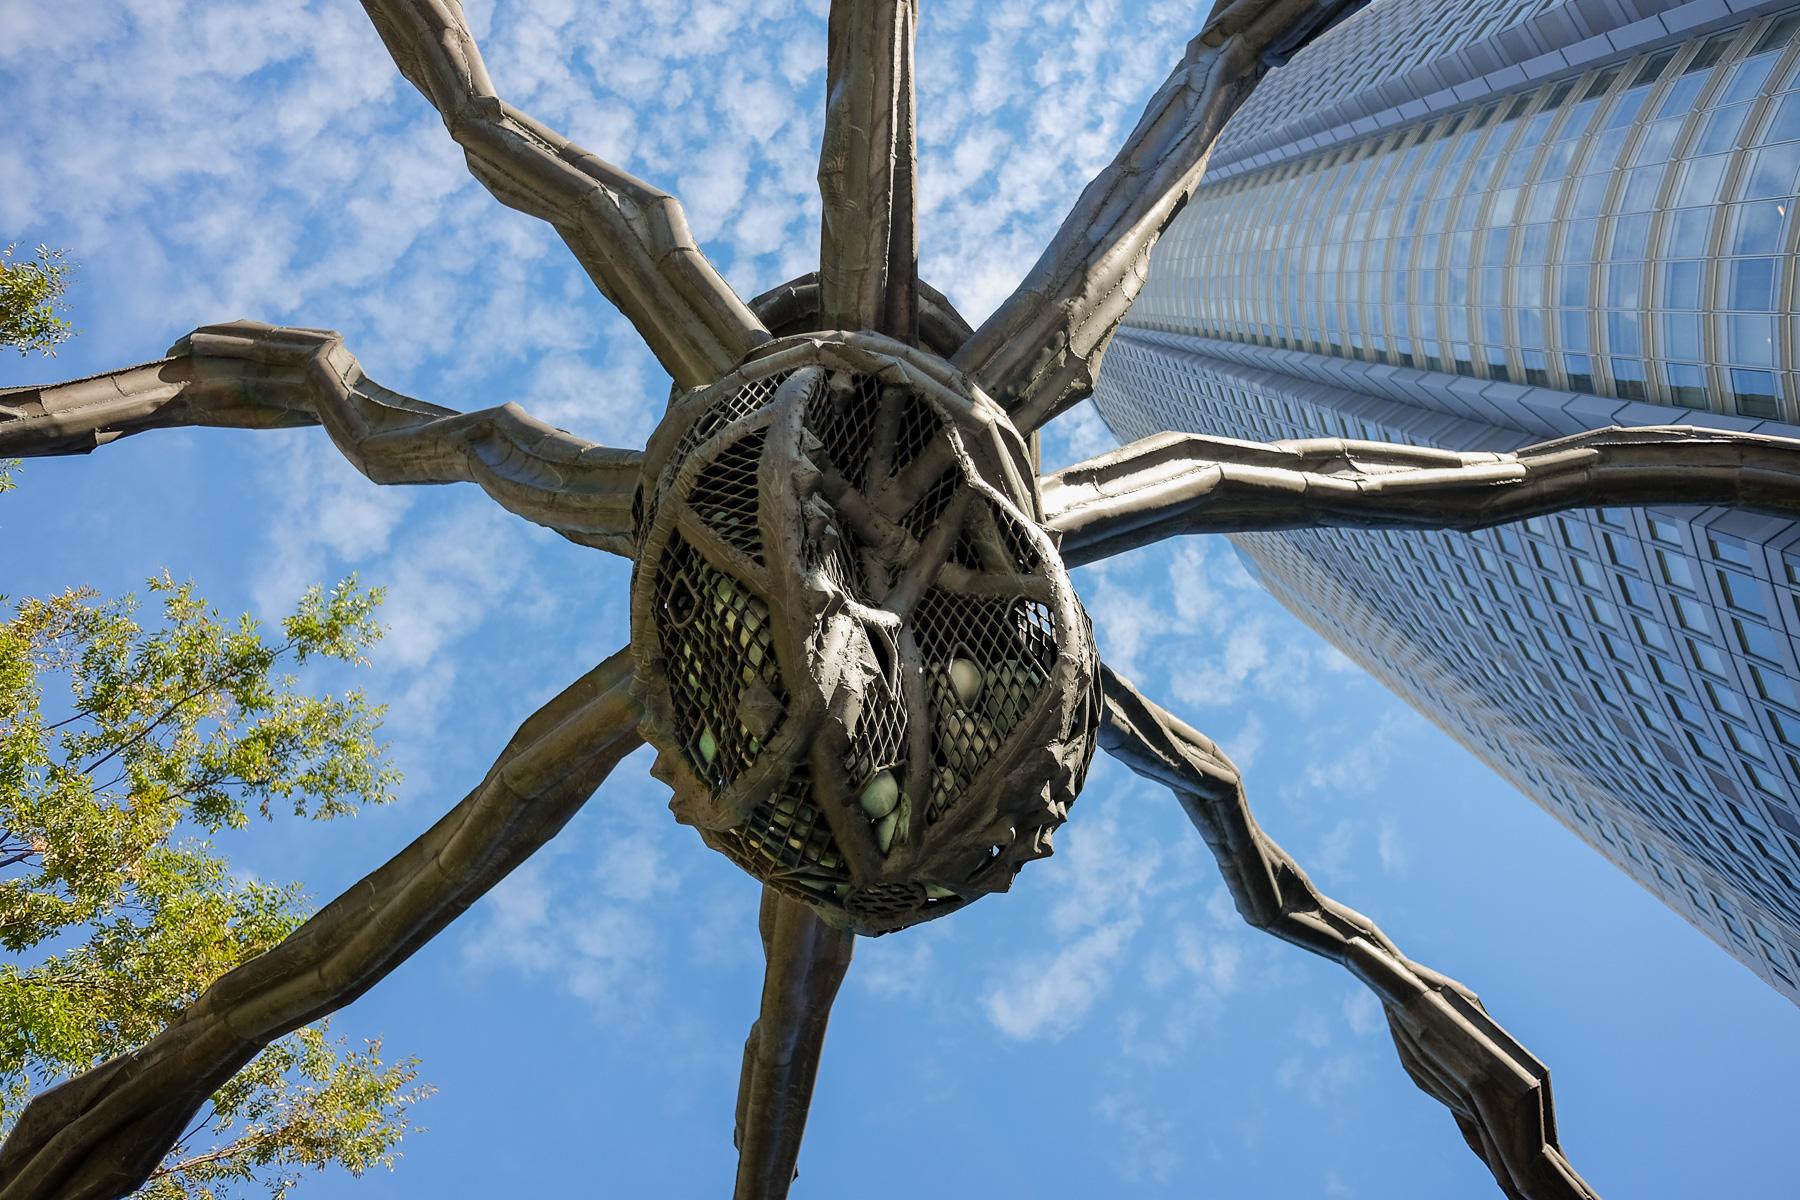 Die Spinne in den Roppongi Hills